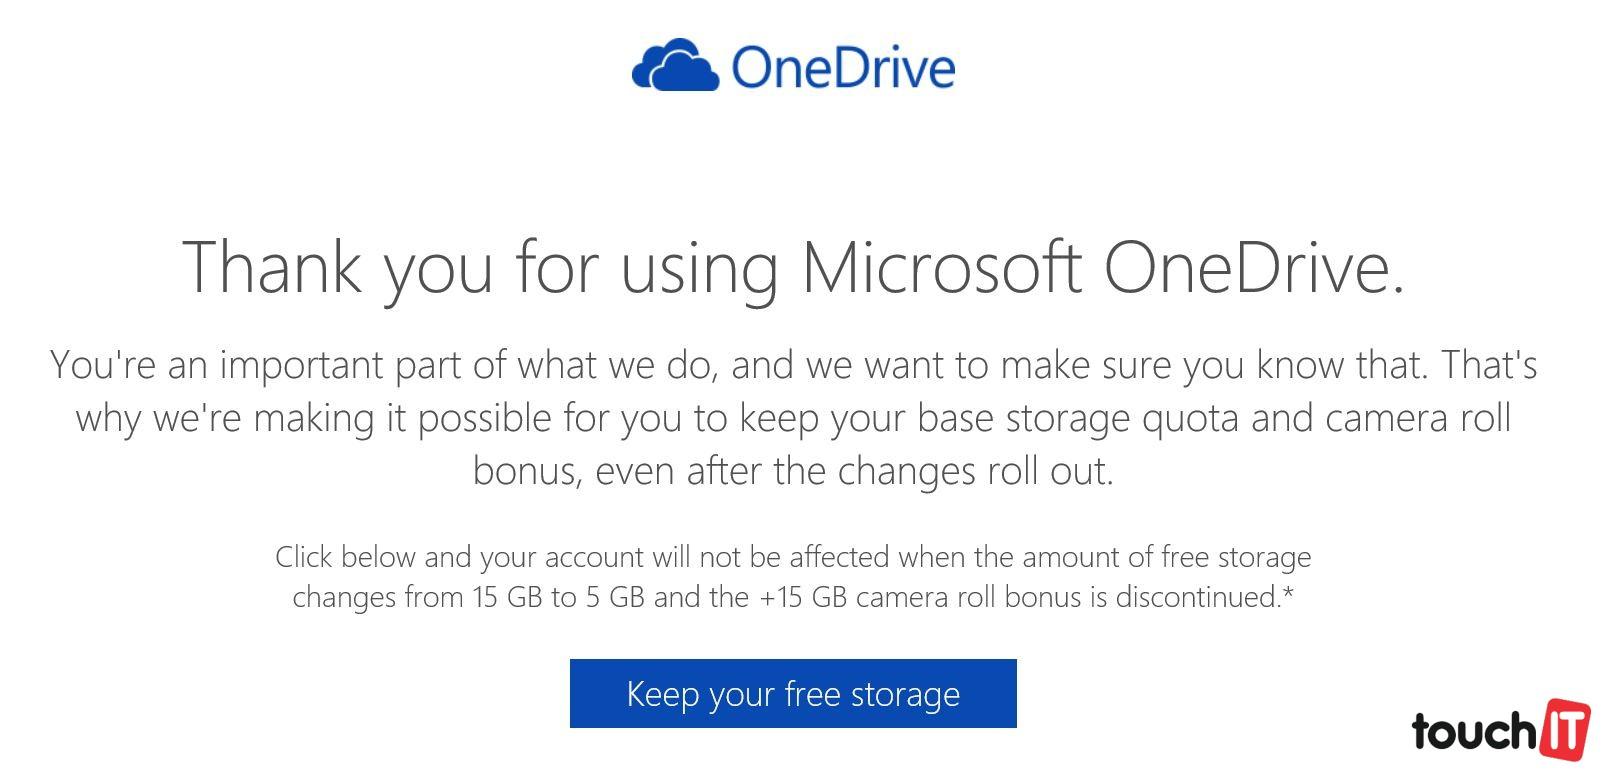 onedrive_free_storage